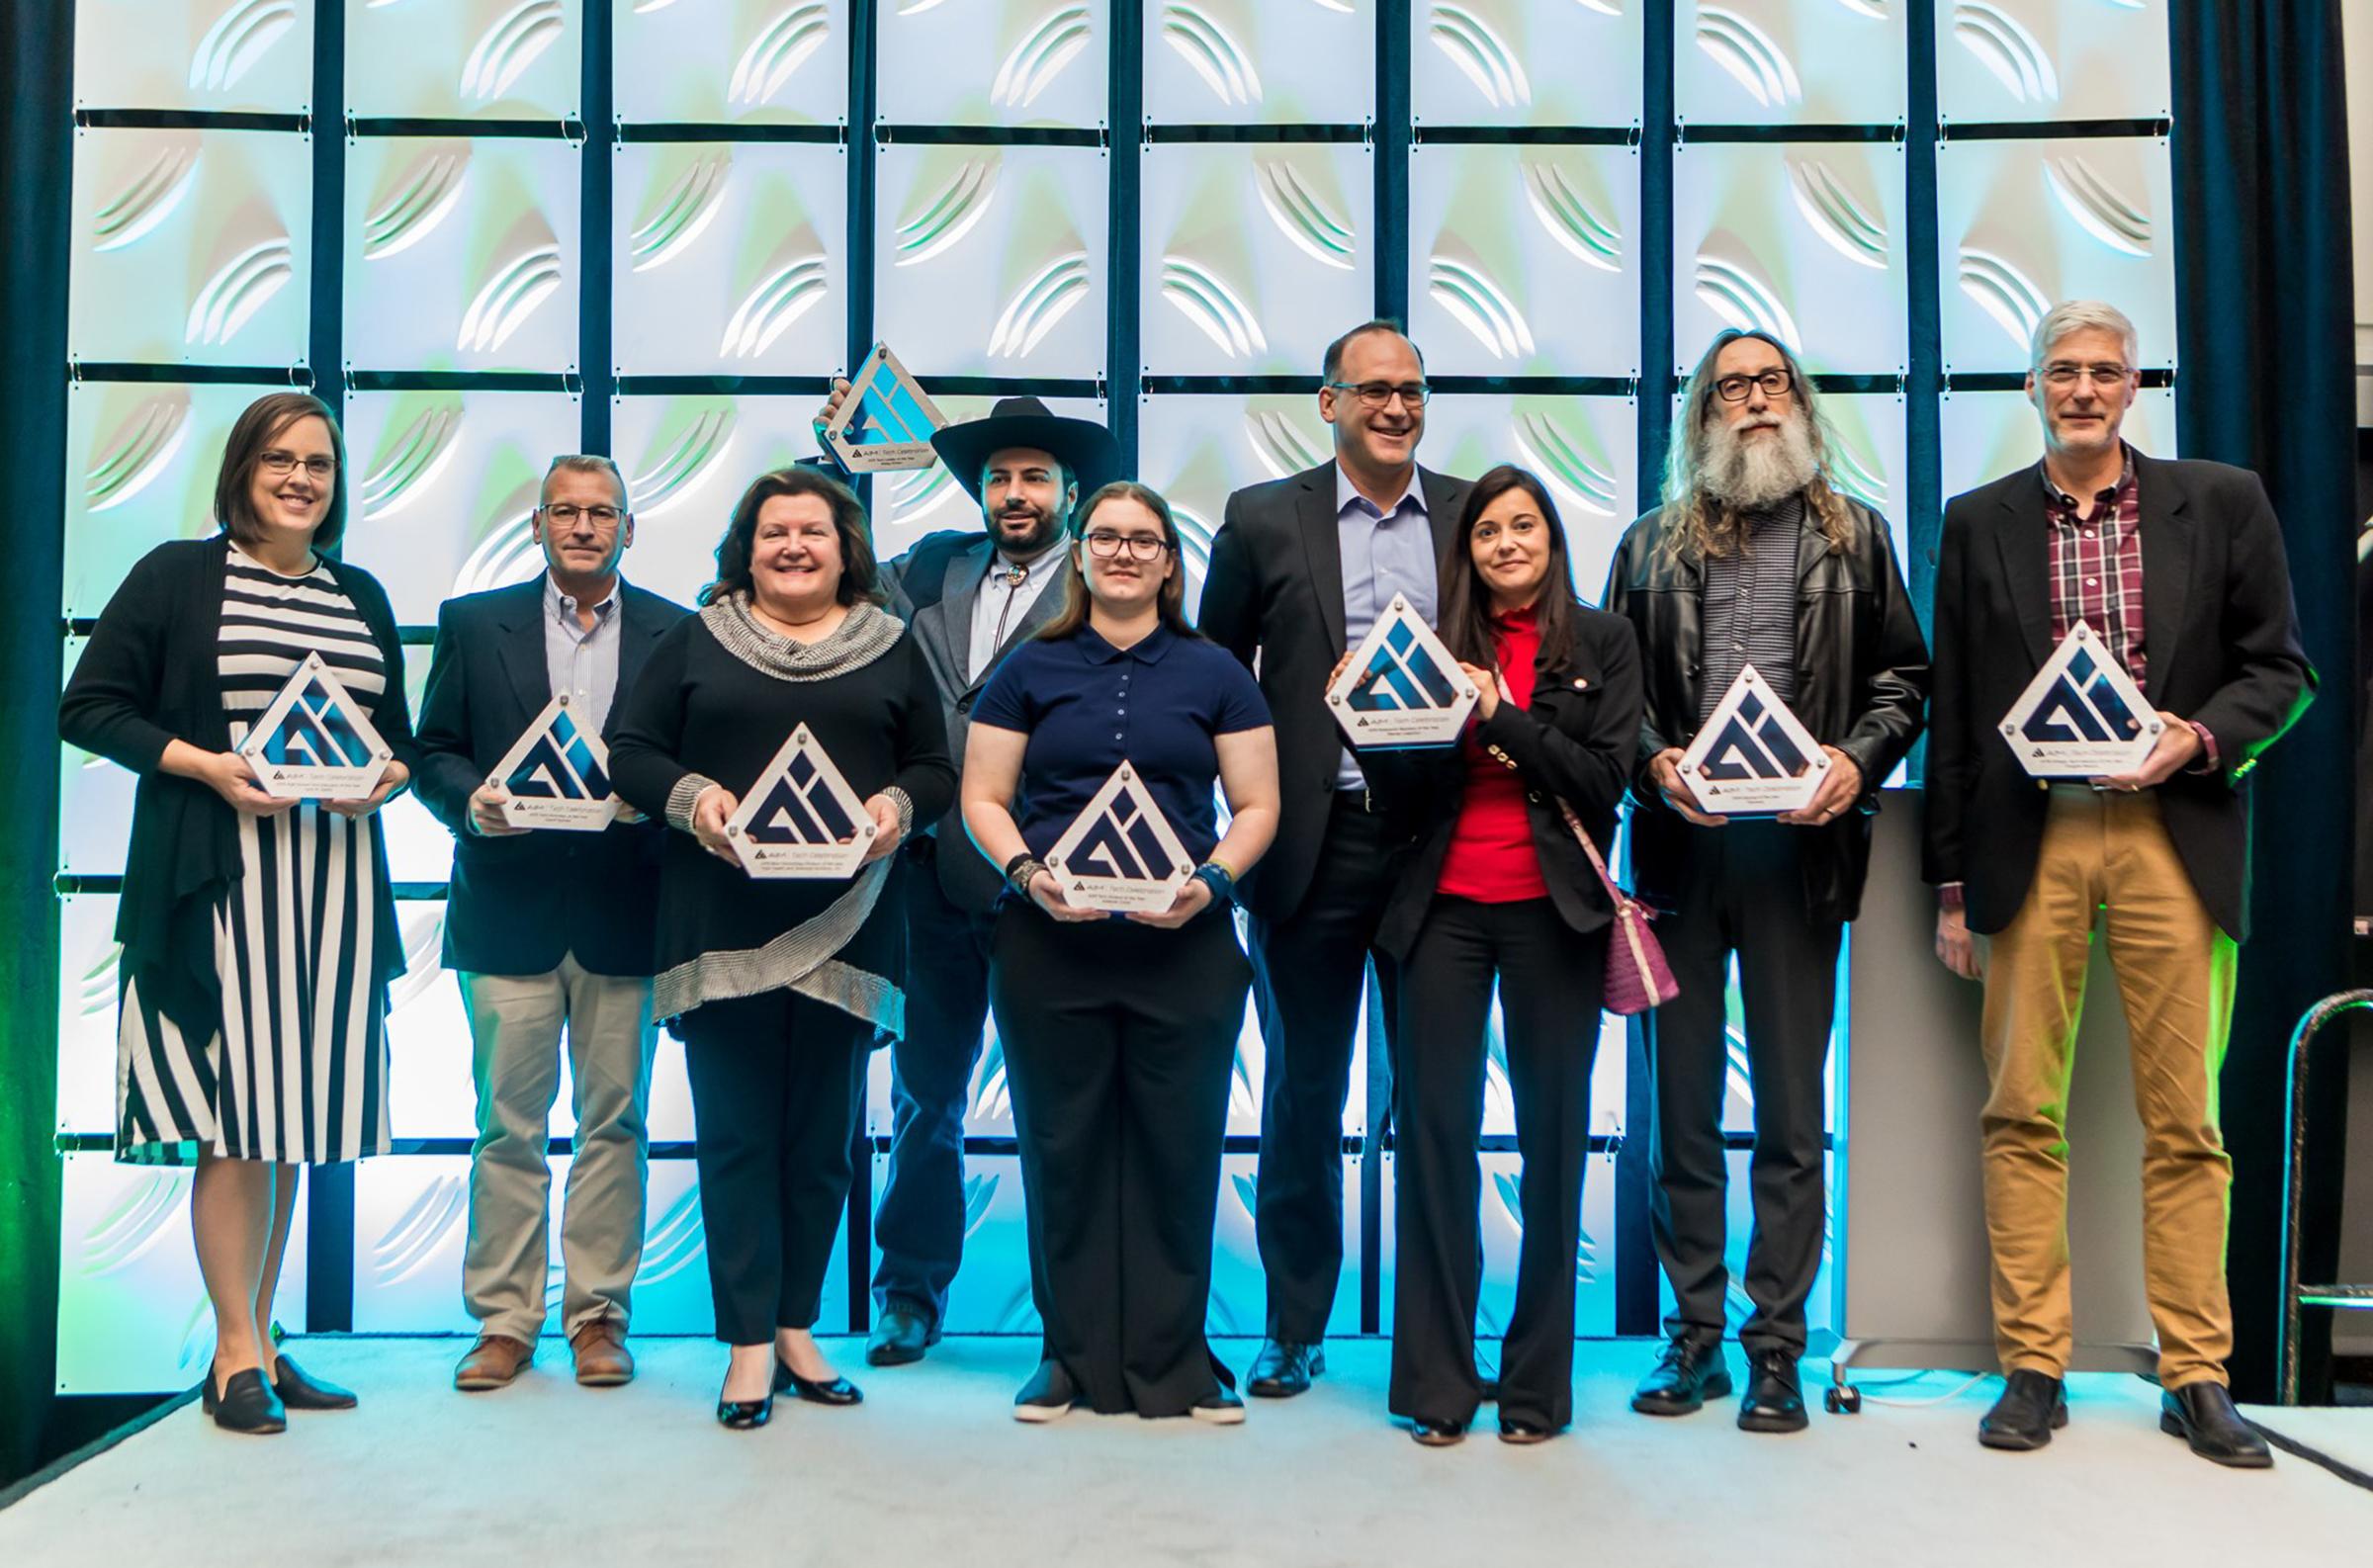 Award winners pose for a photo at the AIM Tech Celebration on Thursday, Nov. 14, 2019. (Courtesy AIM)